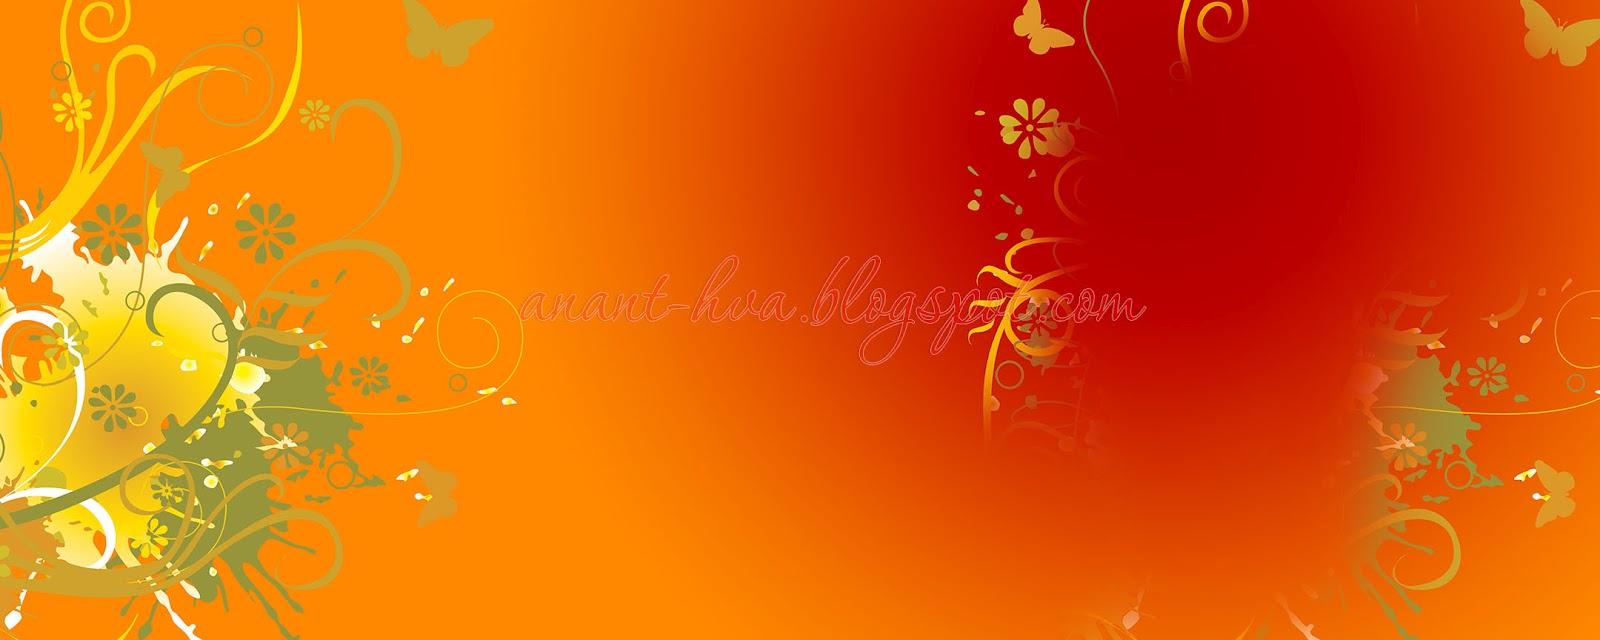 Karizma Background Hd Joy Studio Design Gallery Best